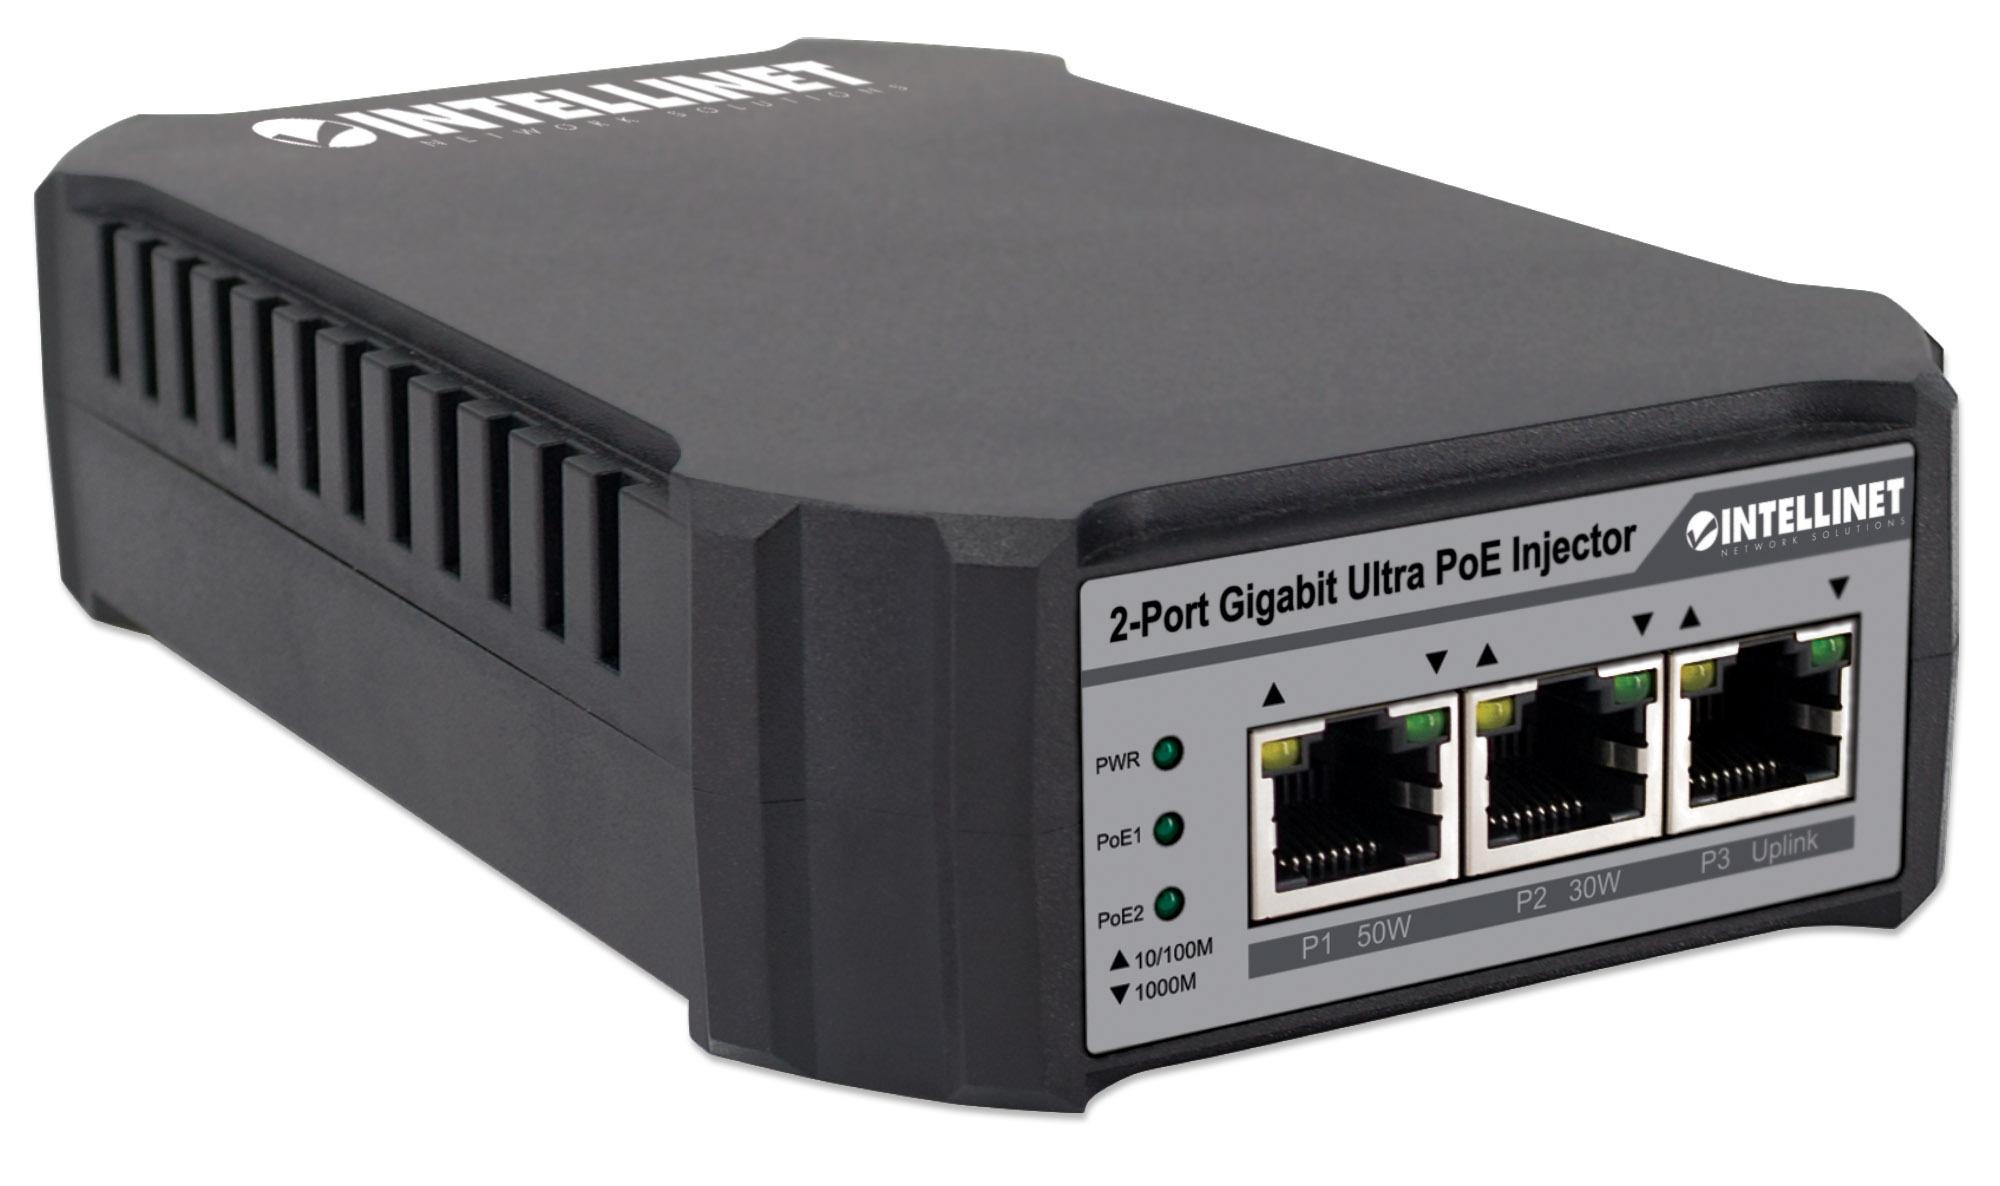 2-Port Gigabit Ultra PoE Injector